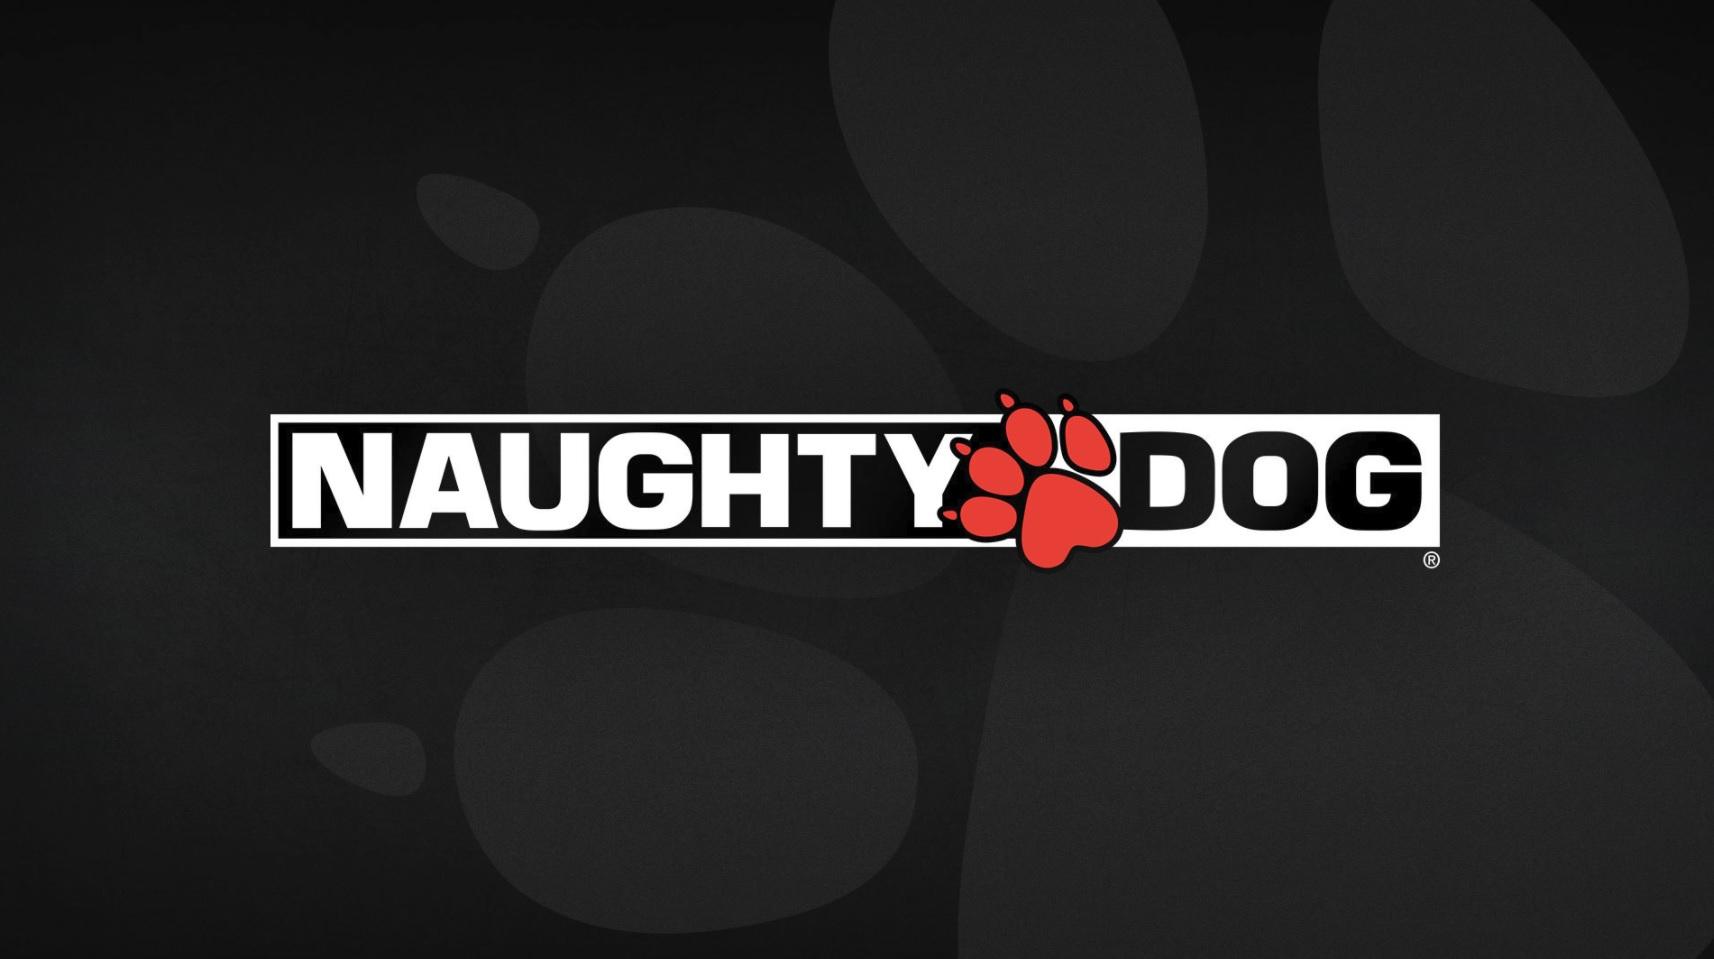 Accusé d'harcèlement sexuel, Naughty Dog répond | PXLBBQ